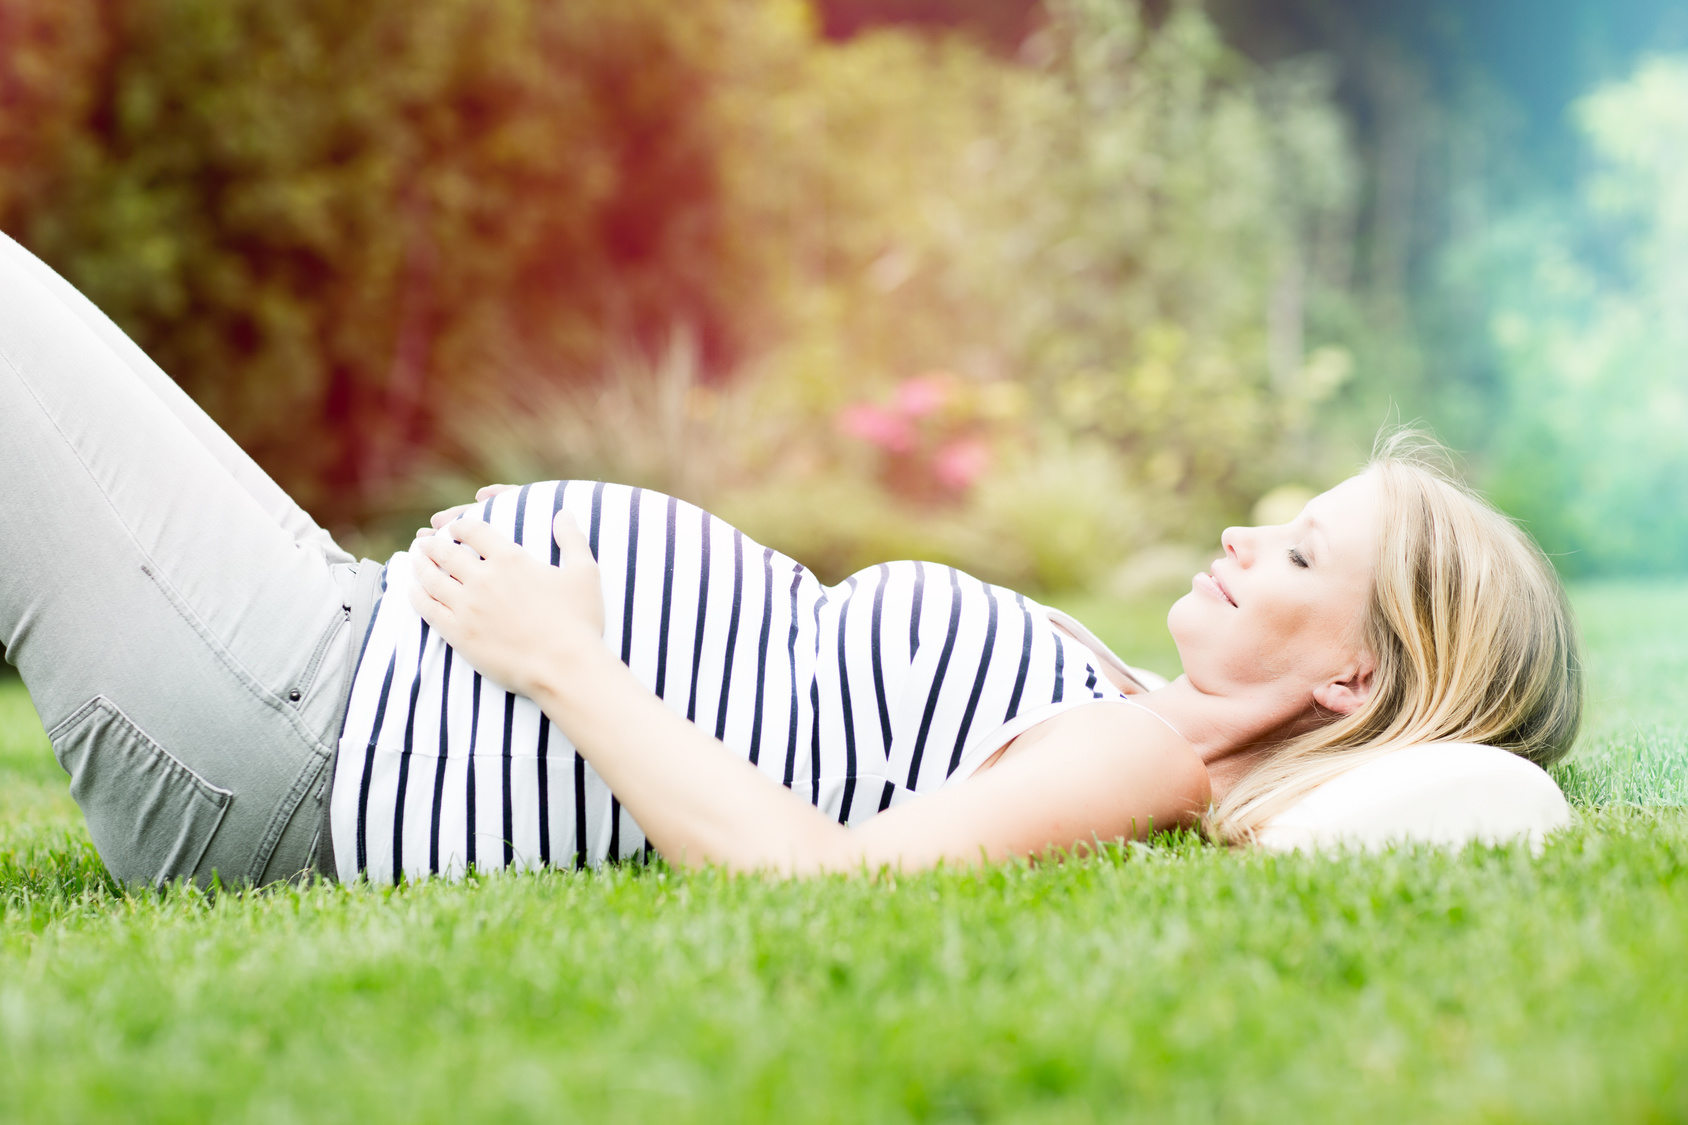 ab wann nach der schwangerschaft abnehmen